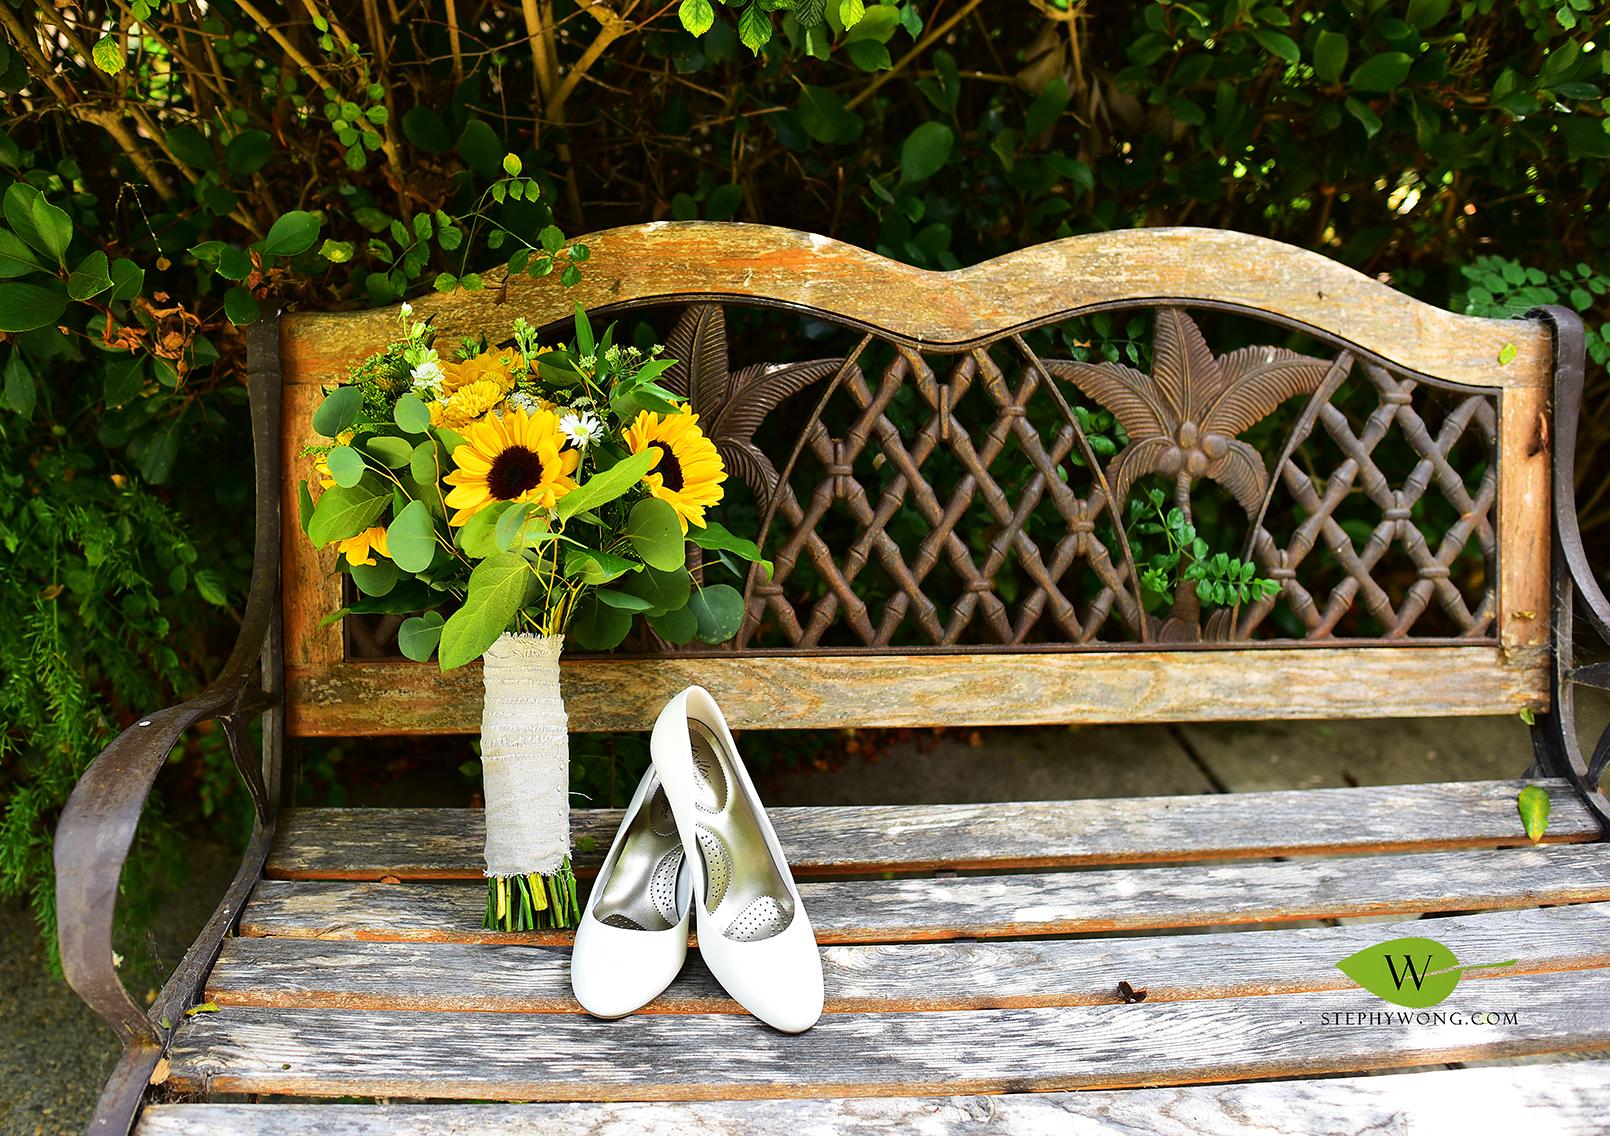 Stephy Wong Photography (Blog) » Maeve + Matt Wedding Teasers – San ...